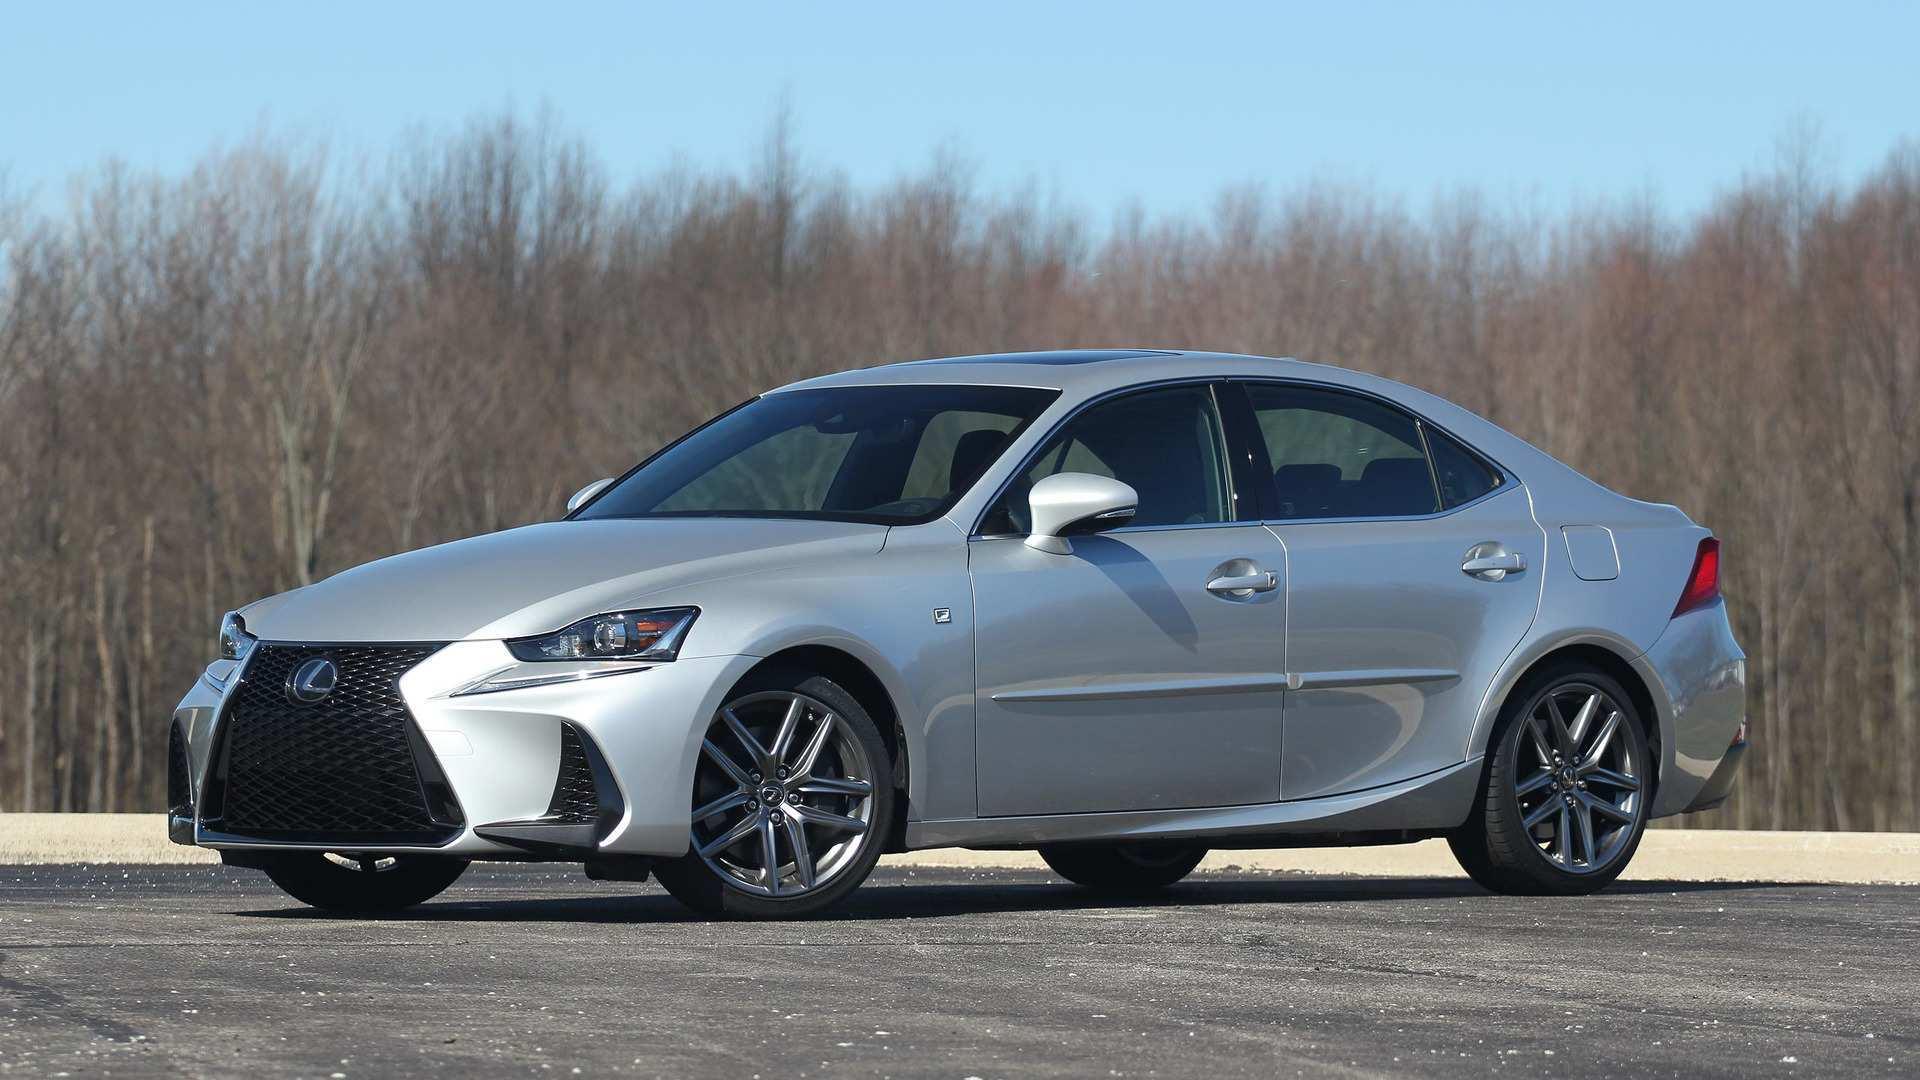 27 Gallery of Lexus Is 2020 Redesign Speed Test with Lexus Is 2020 Redesign